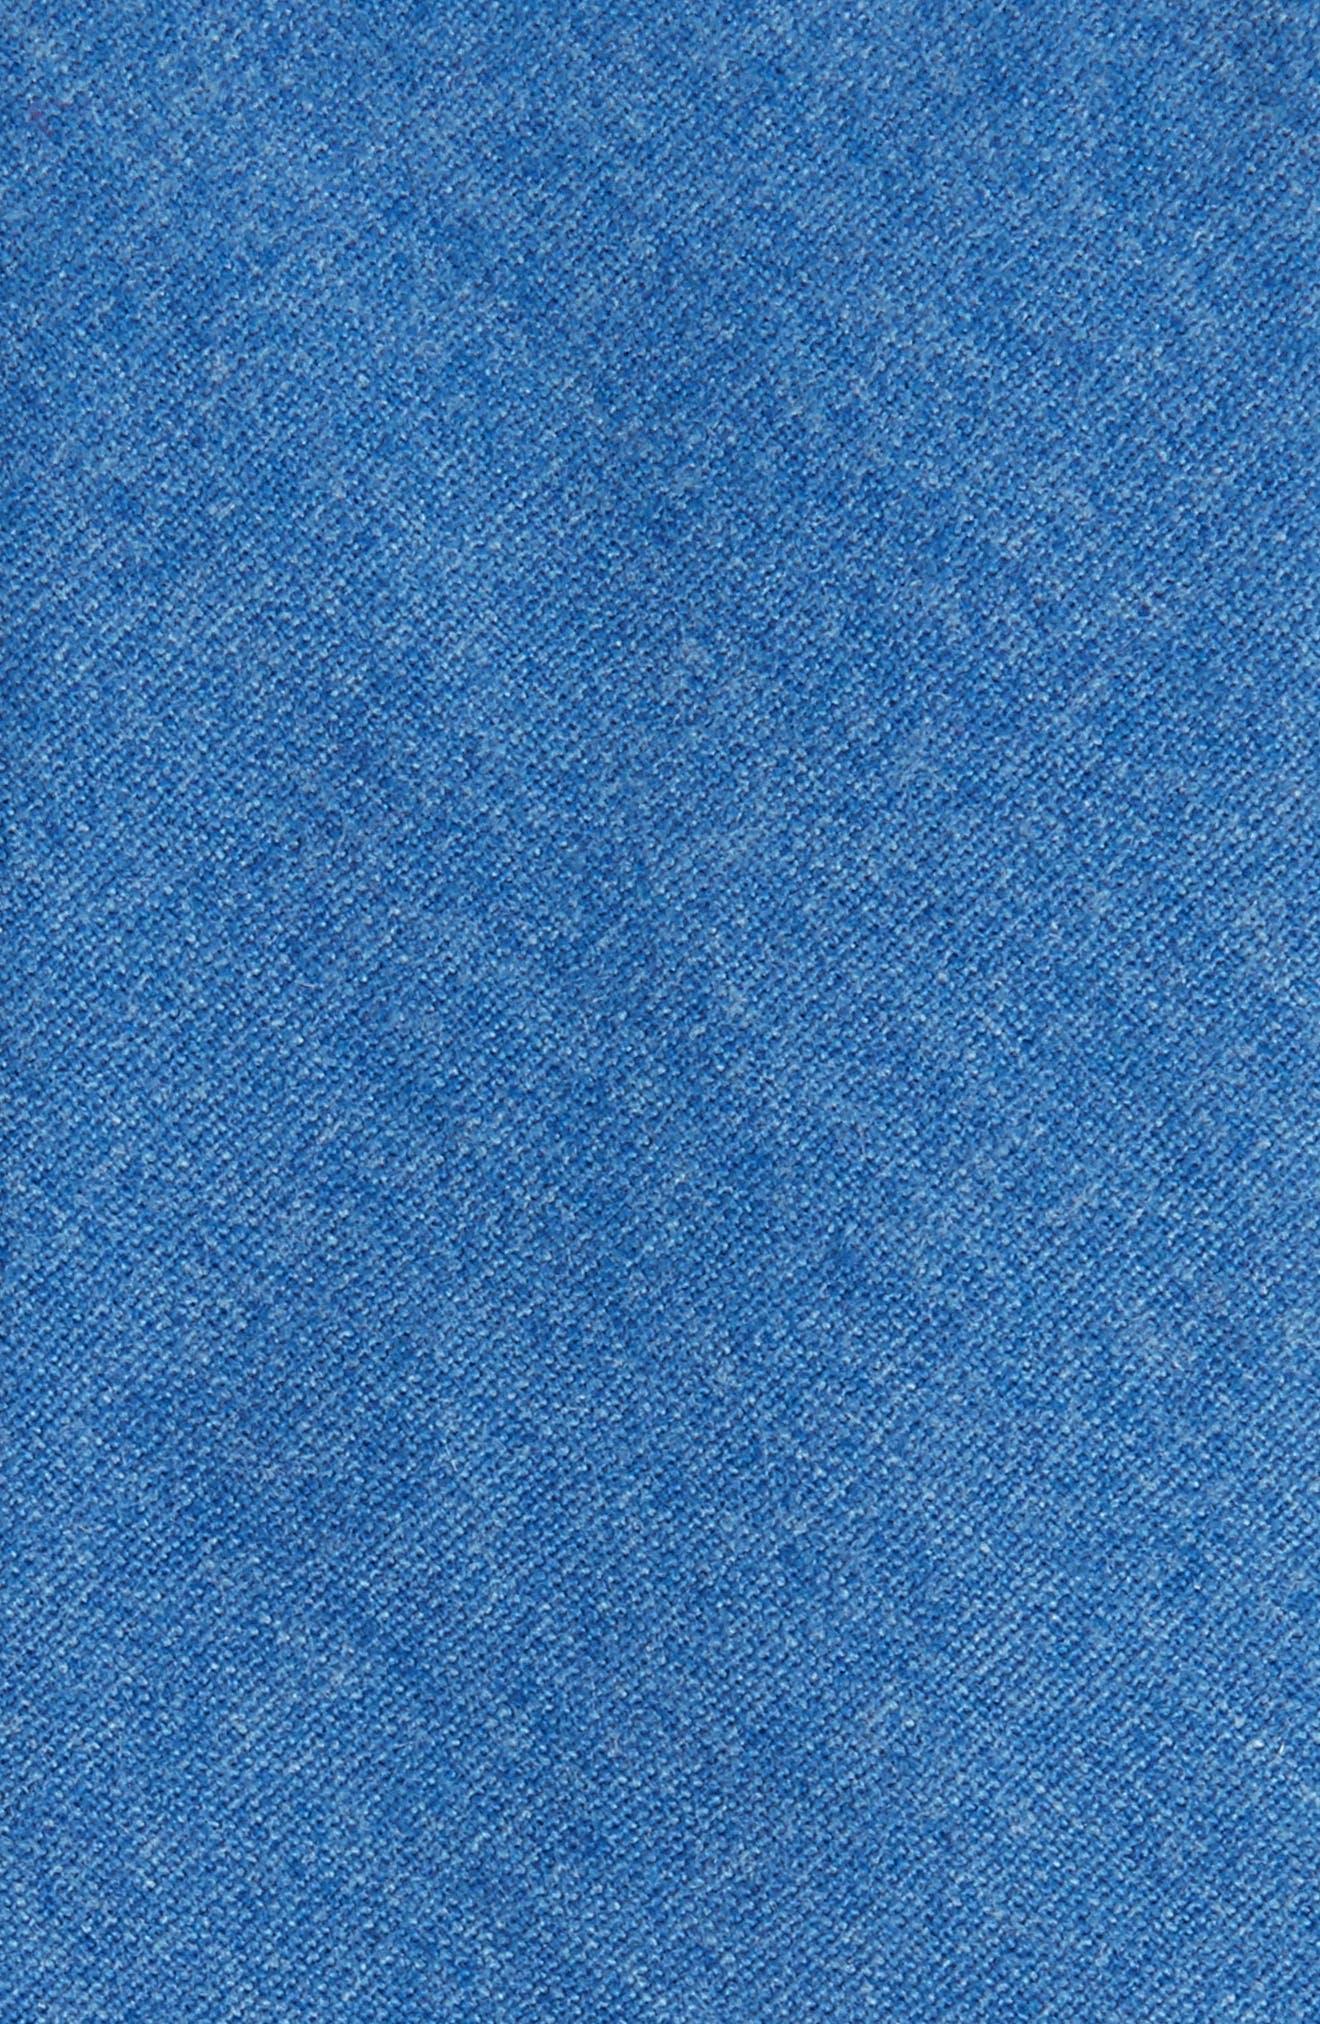 Bert Solid Cotton Skinny Tie,                             Alternate thumbnail 2, color,                             Blue